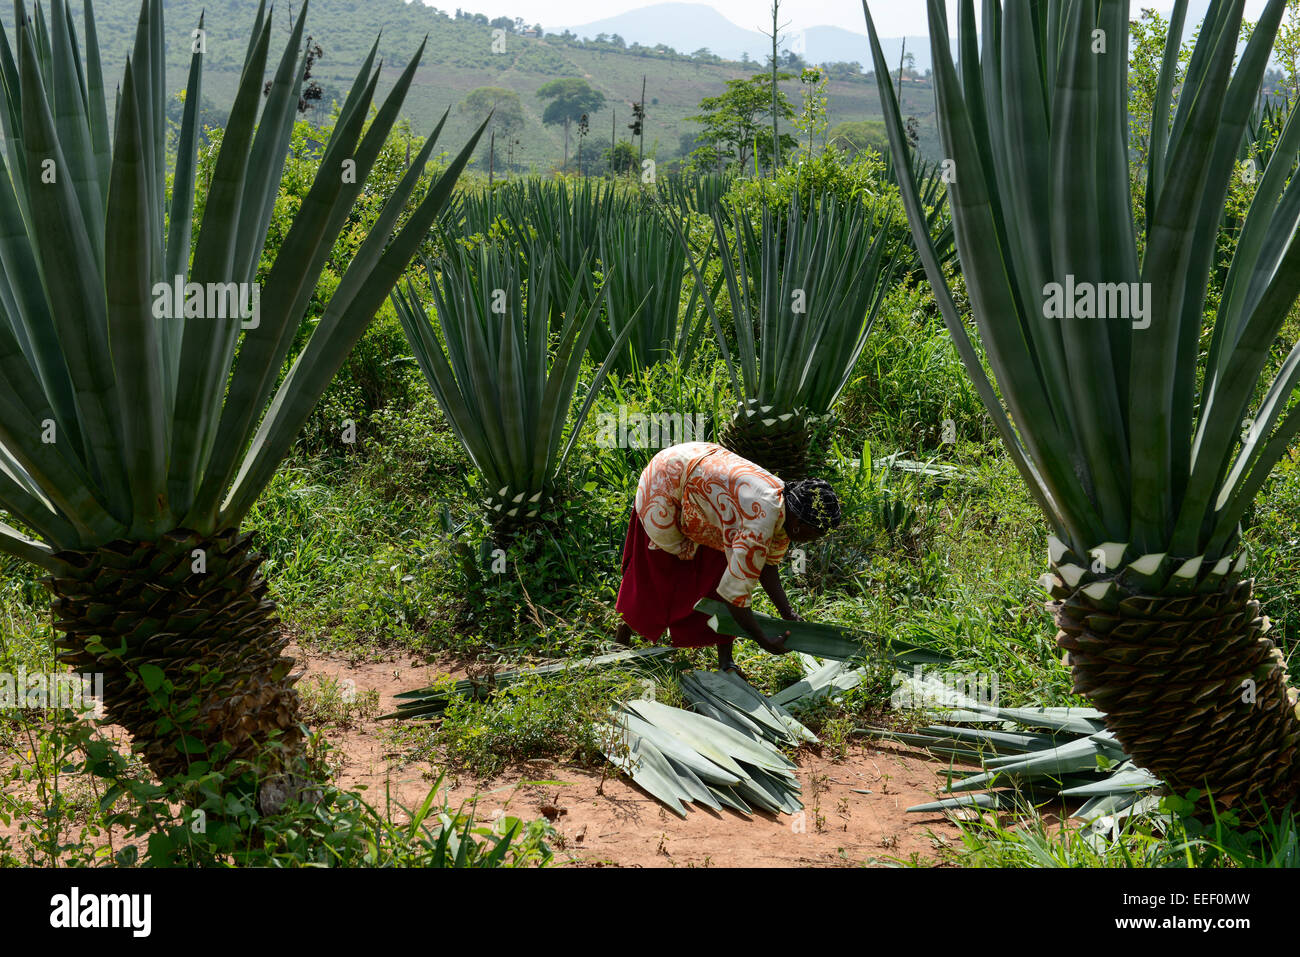 TANZANIA, Tanga, Korogwe, Sisal plantation in Kwalukonge, salariato agricolo raccolto sisal foglie che vengono utilizzati Immagini Stock